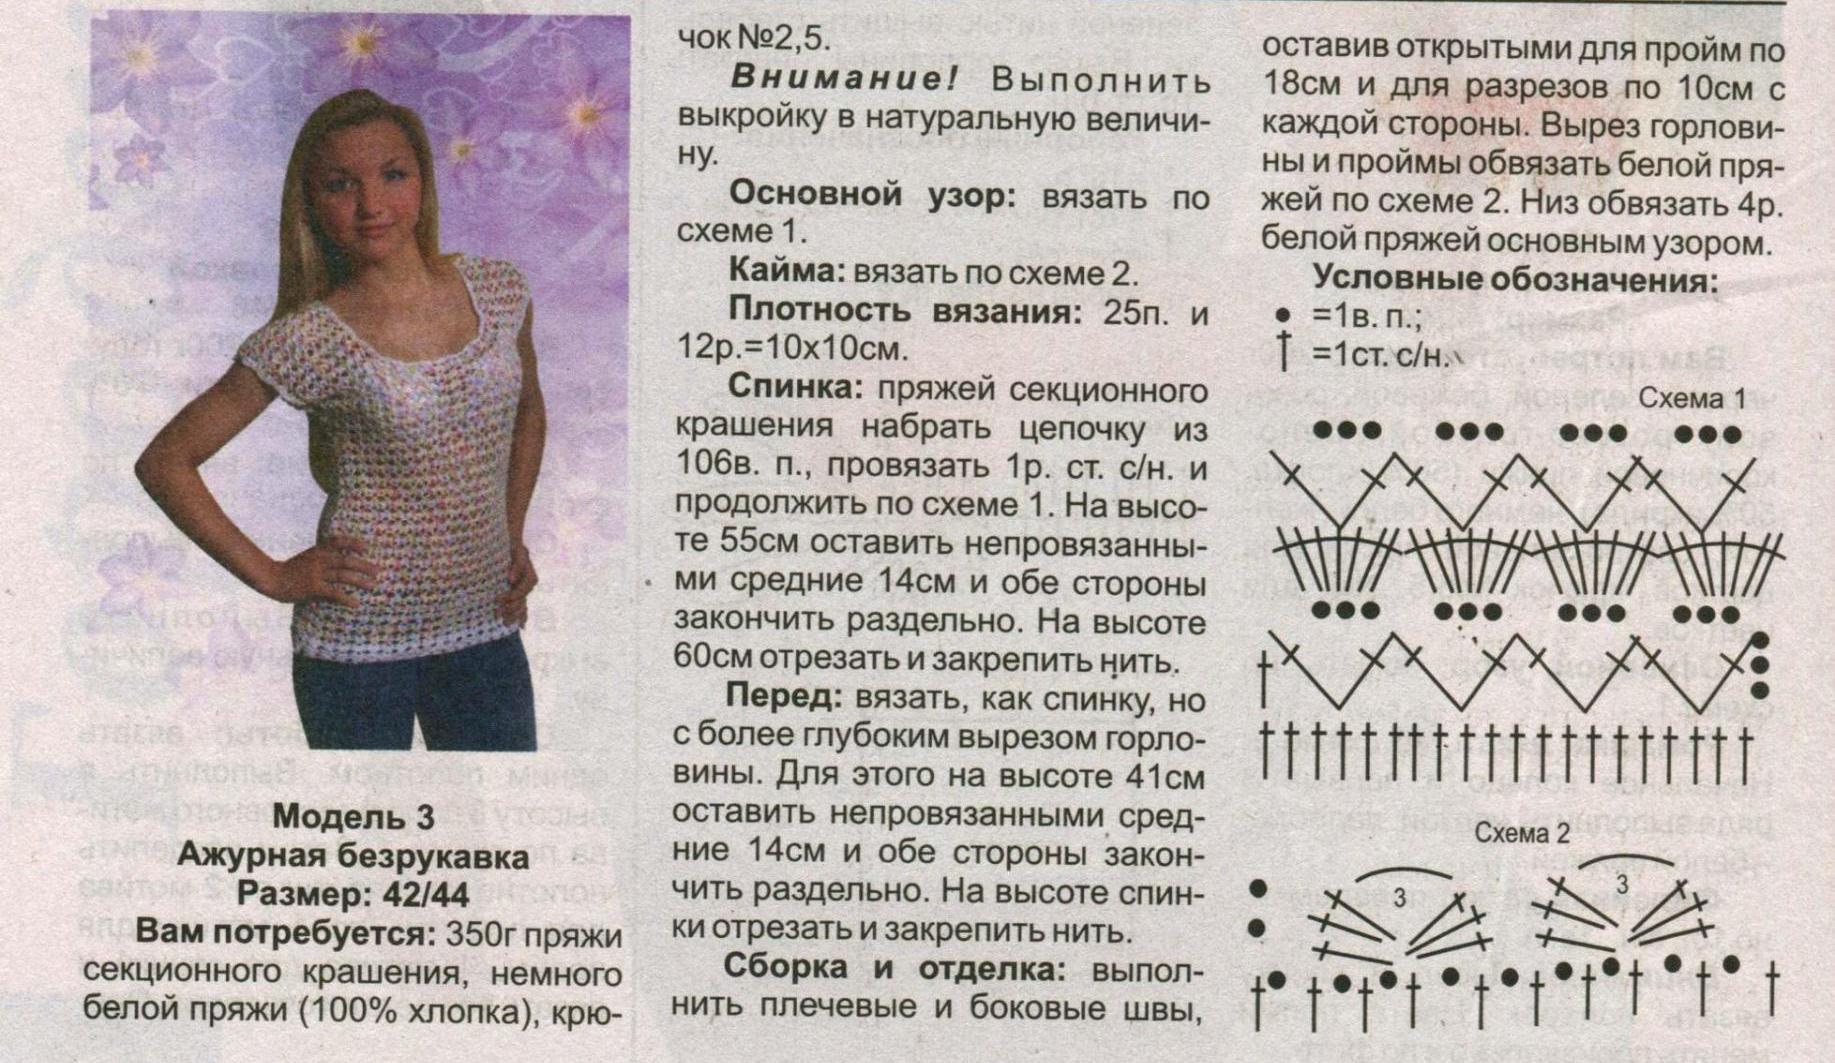 1354_koll-viaz-idei5-15_04 (2)